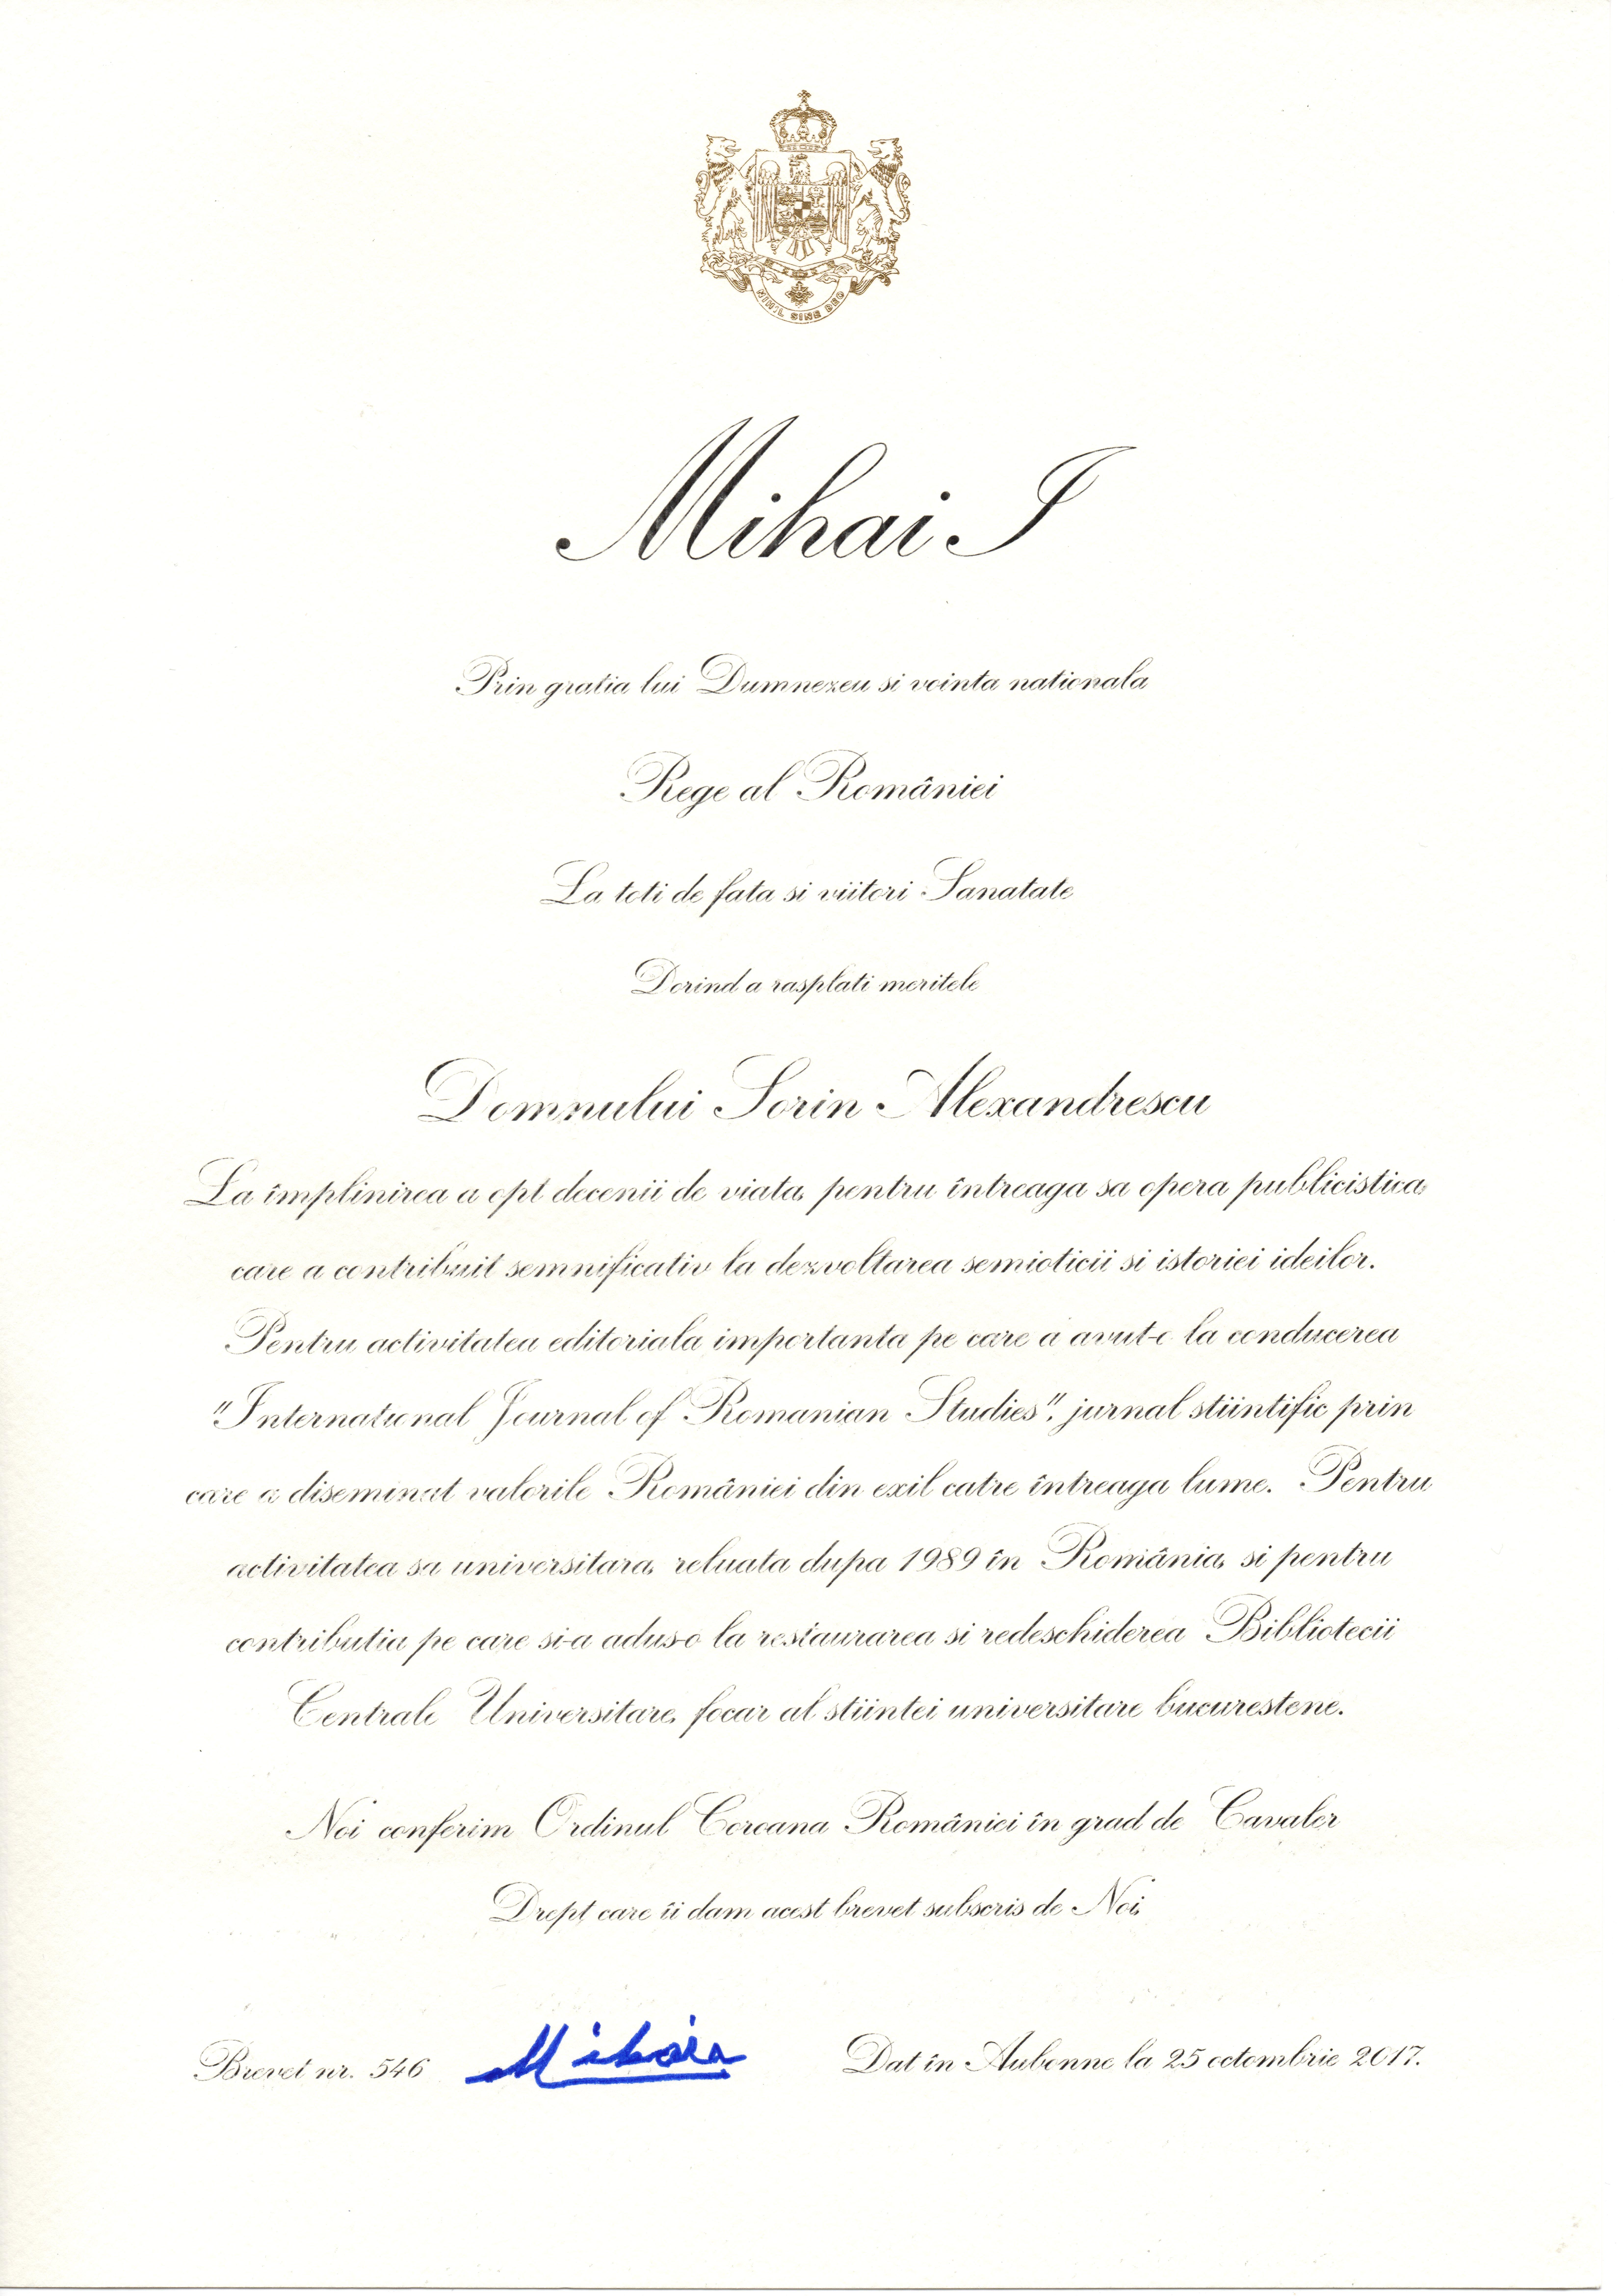 diploma-ordin-coroana-romaniei-in-grad-de-cavaler-sorin-alexandrescu-2017